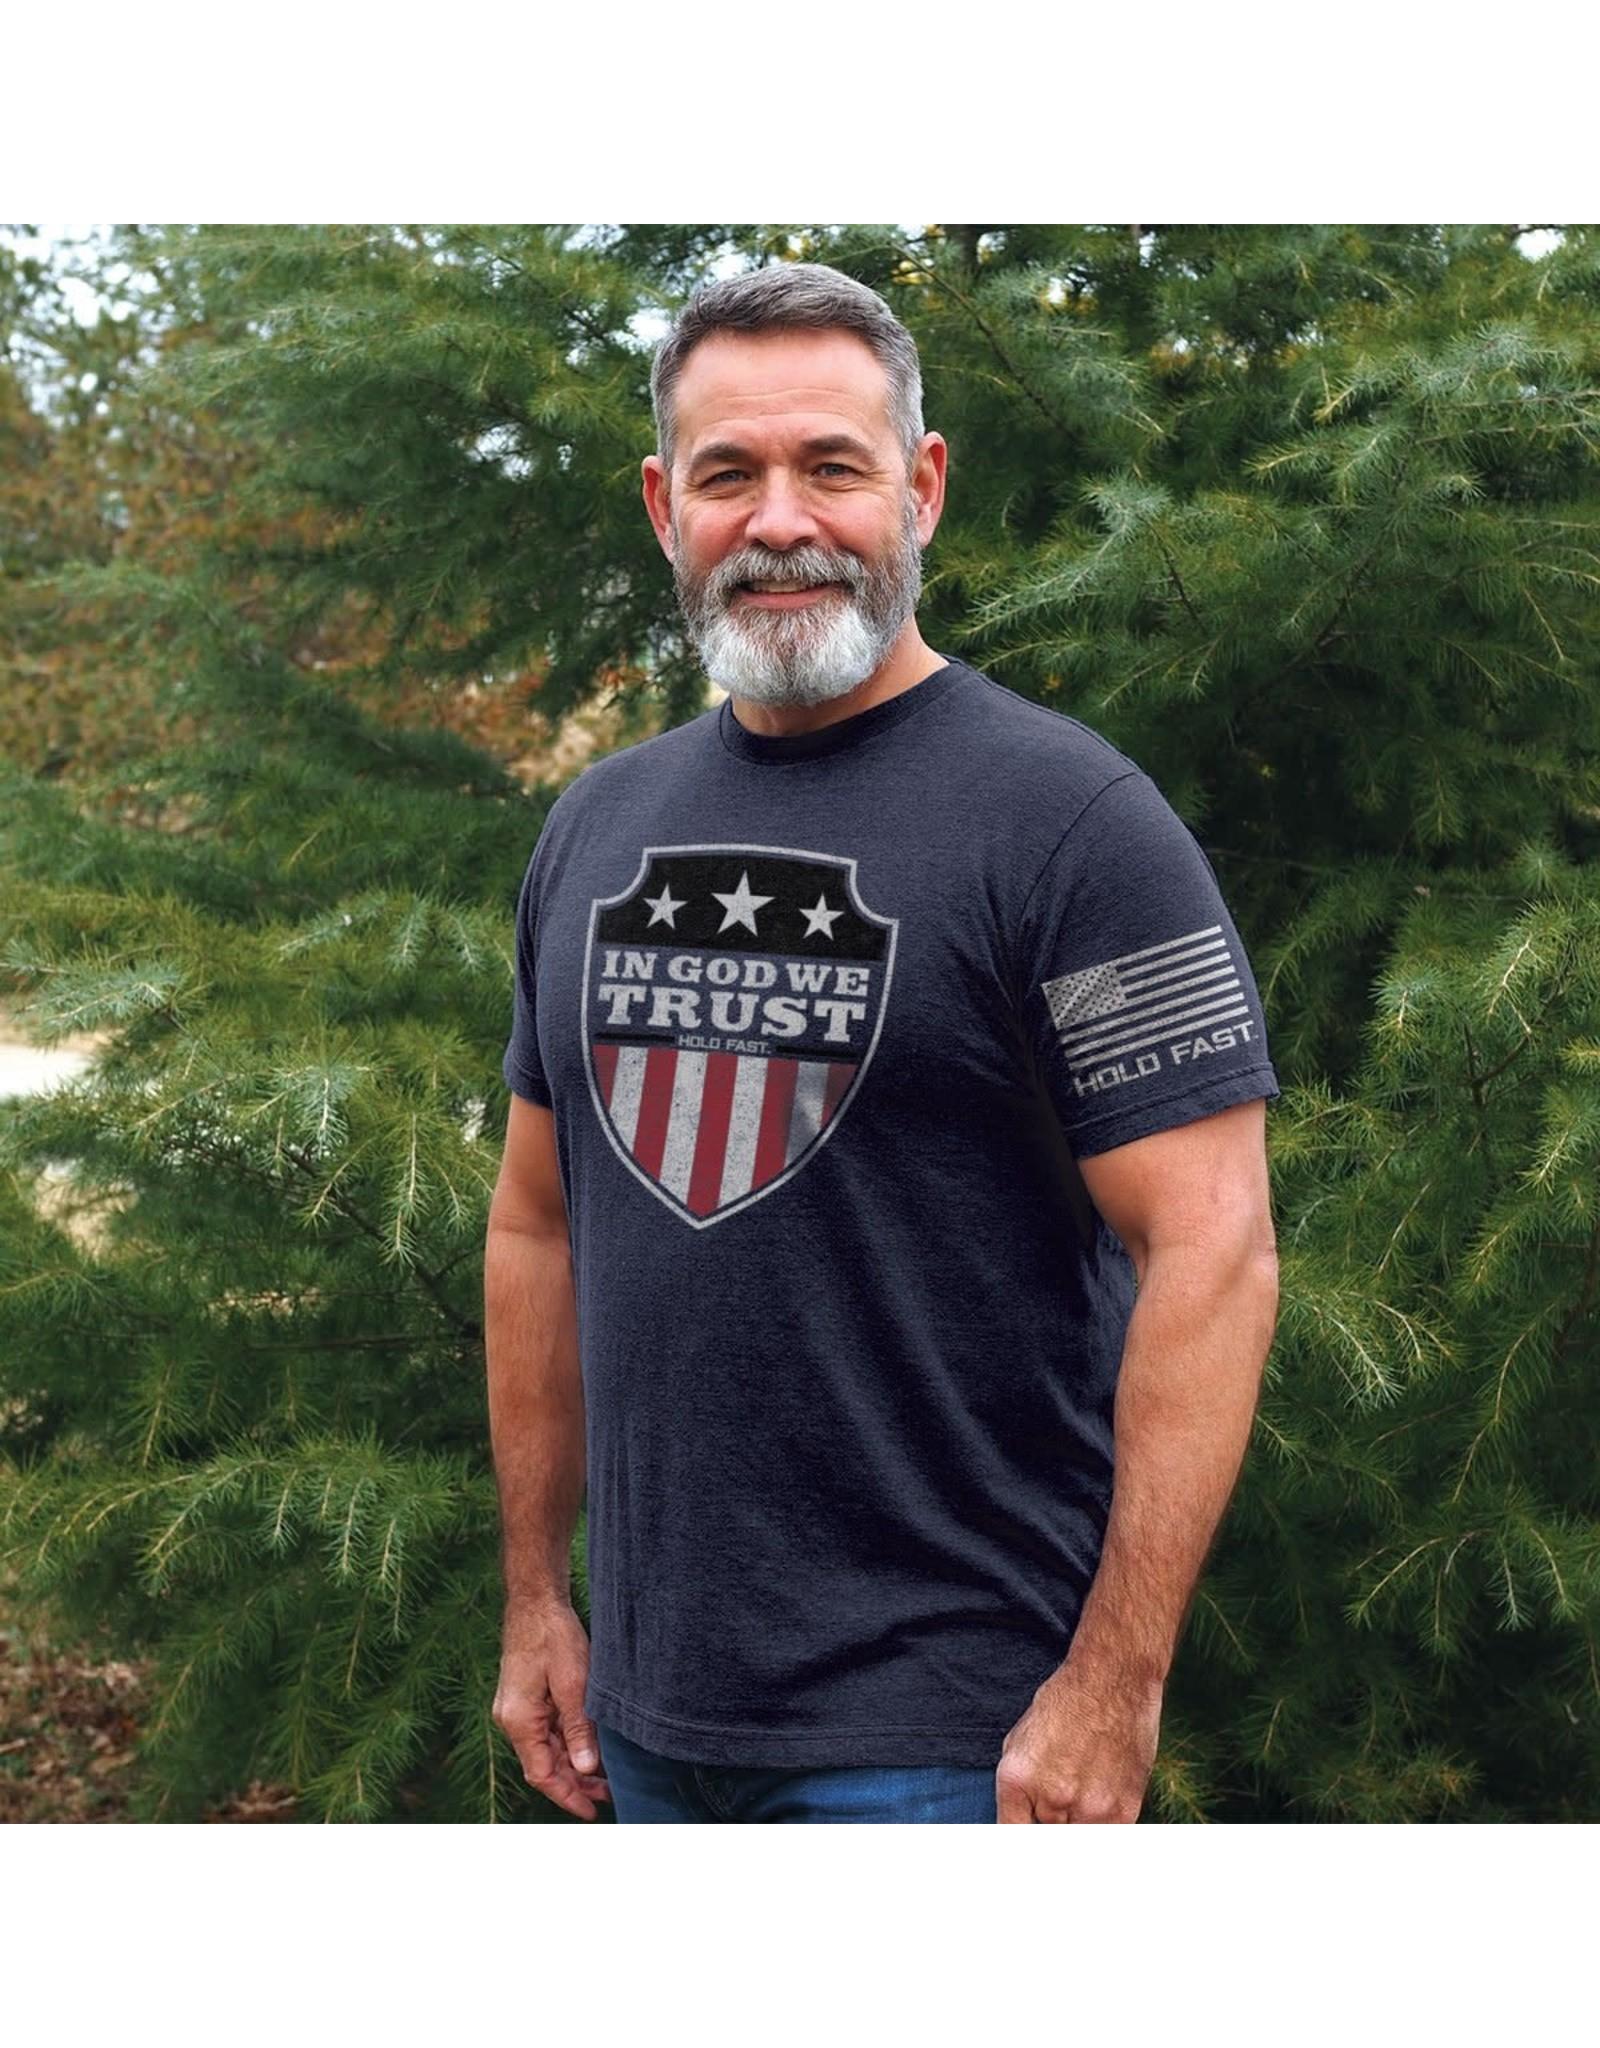 Adult Shirt - In God We Trust Shield